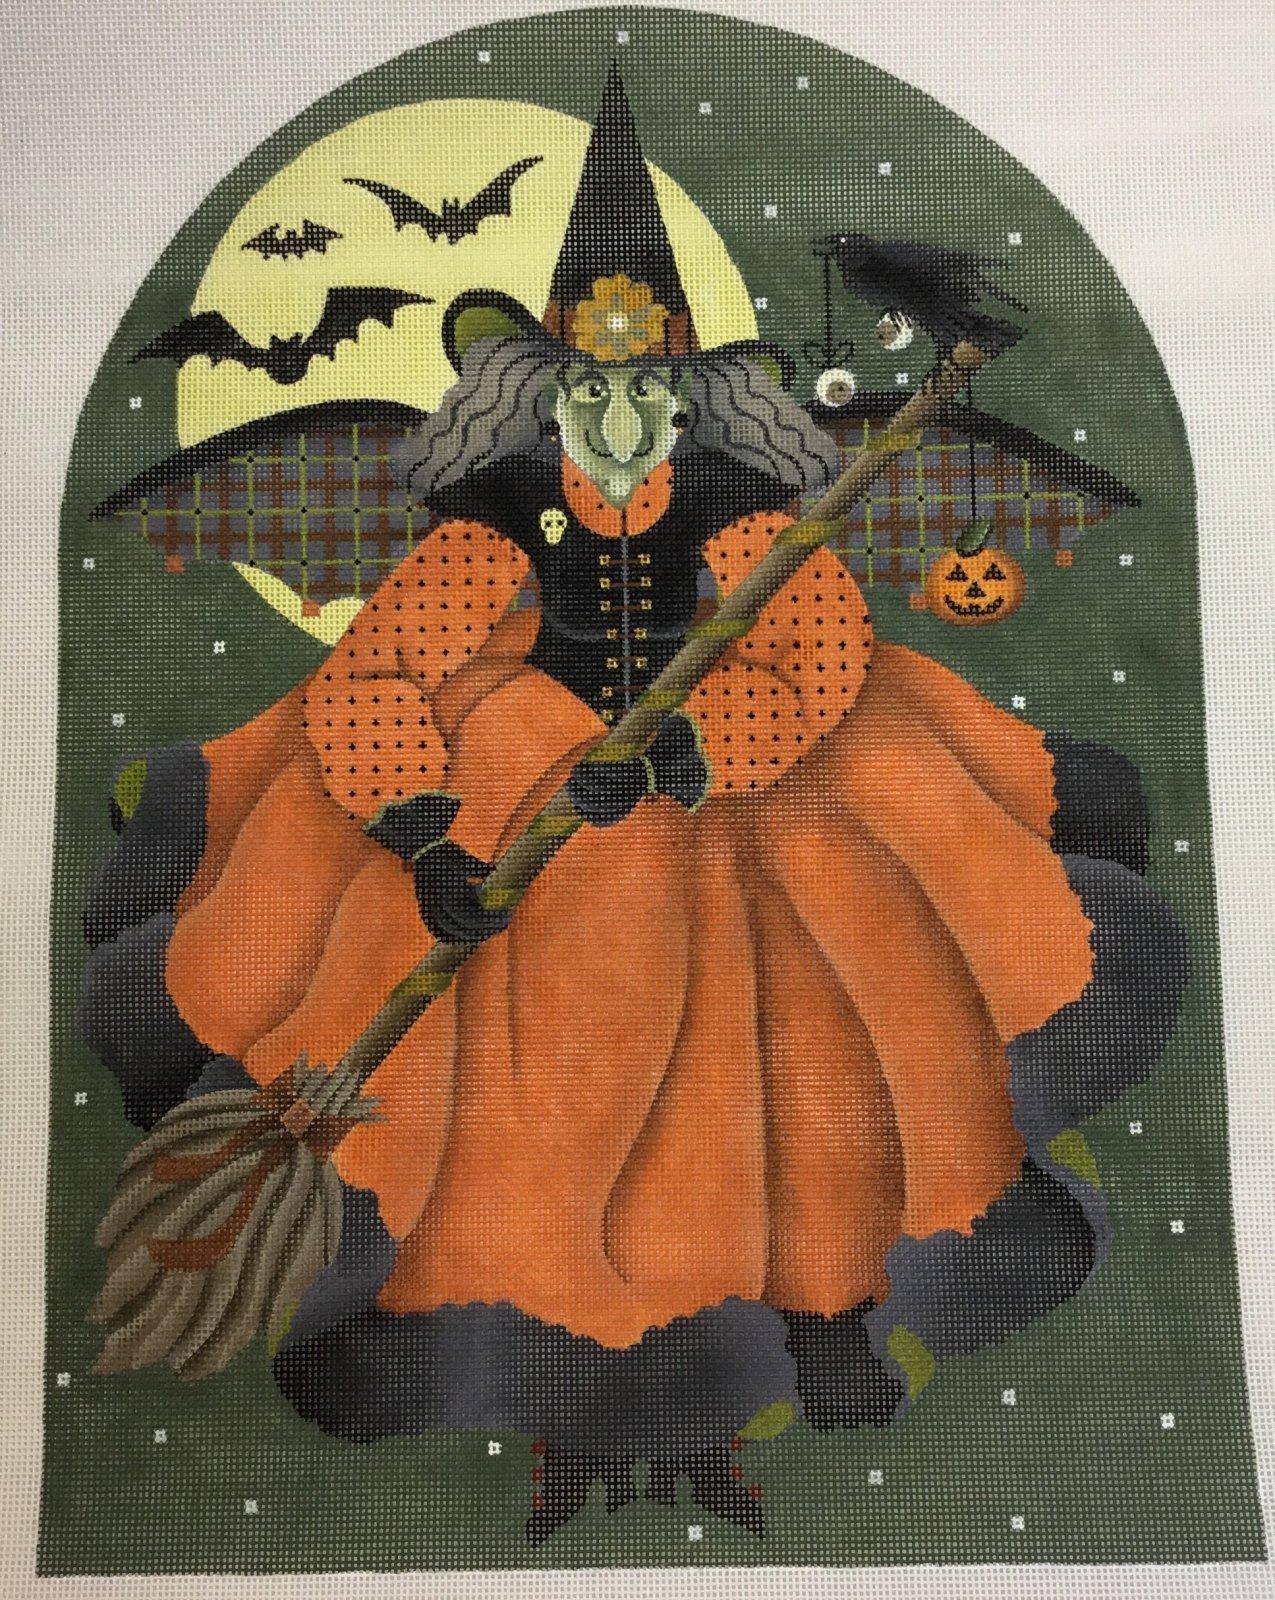 Hagetha the Witch,18ct.,11x15